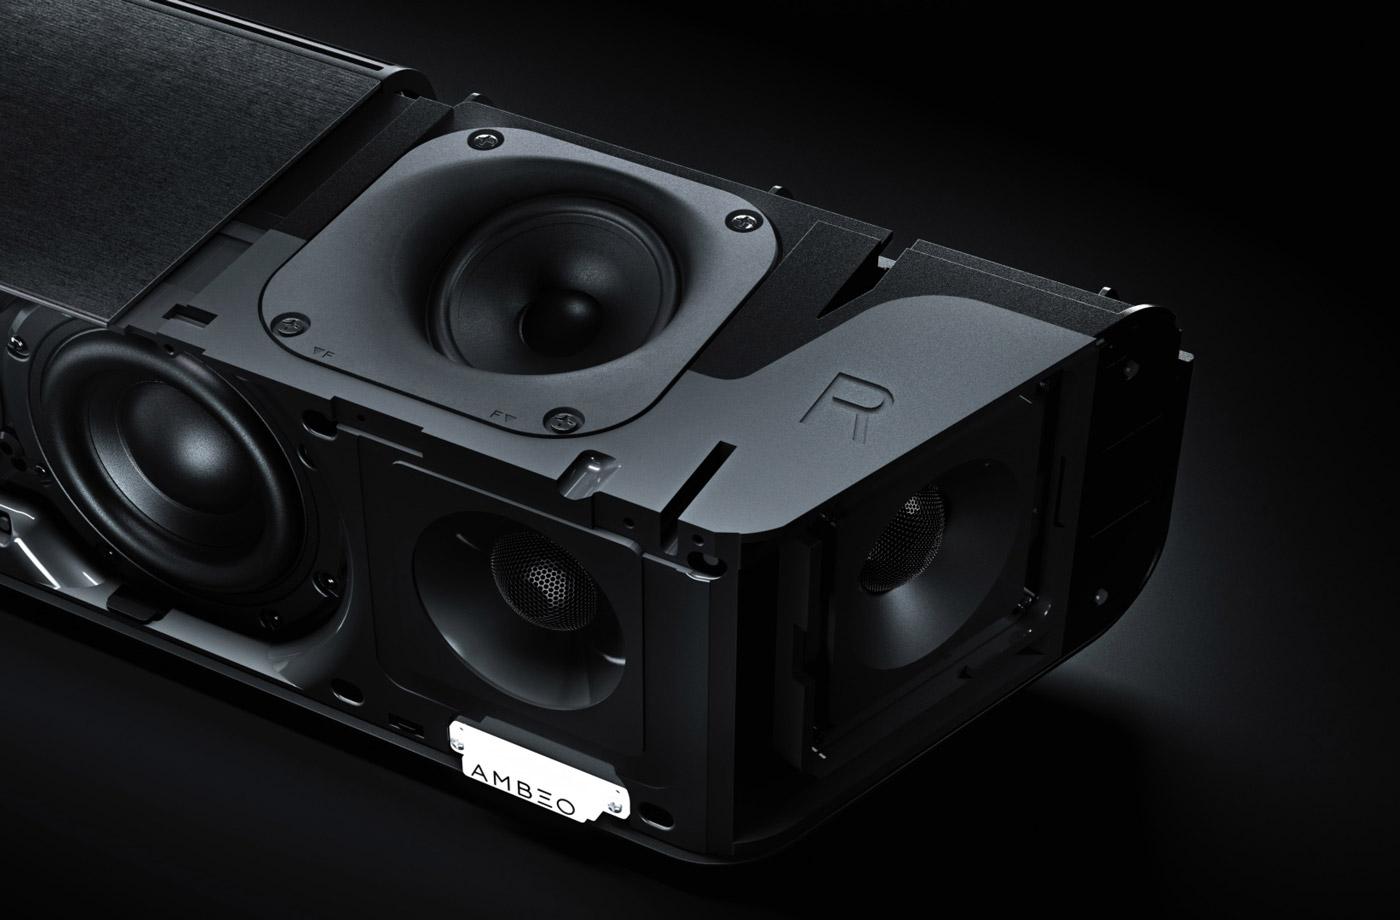 design of a sennheiser audio product